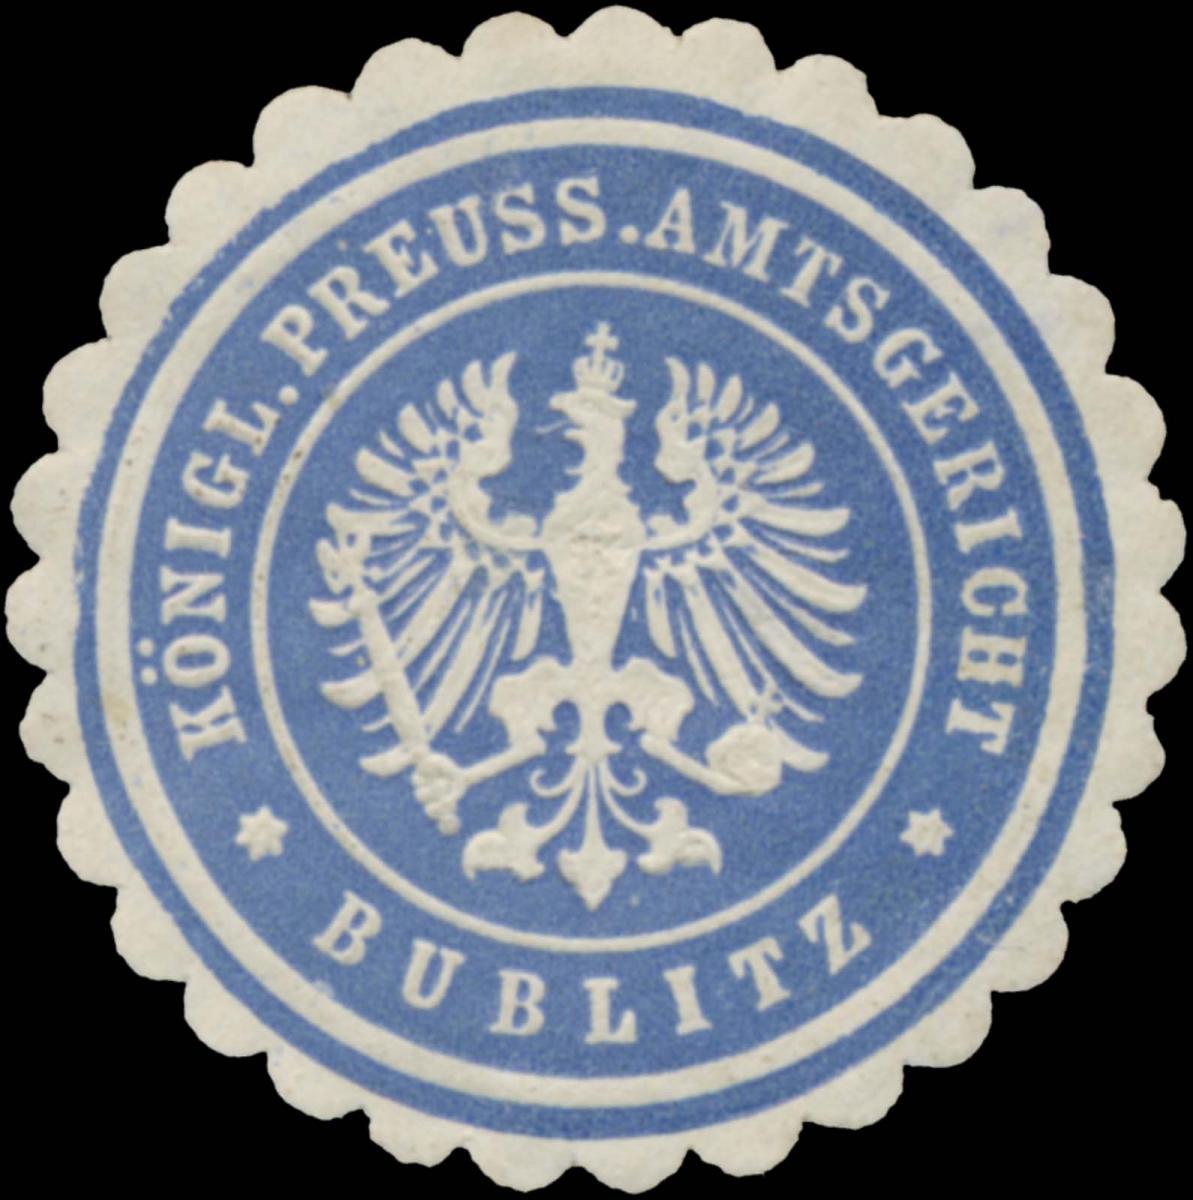 K.Pr. Amtsgericht Bublitz